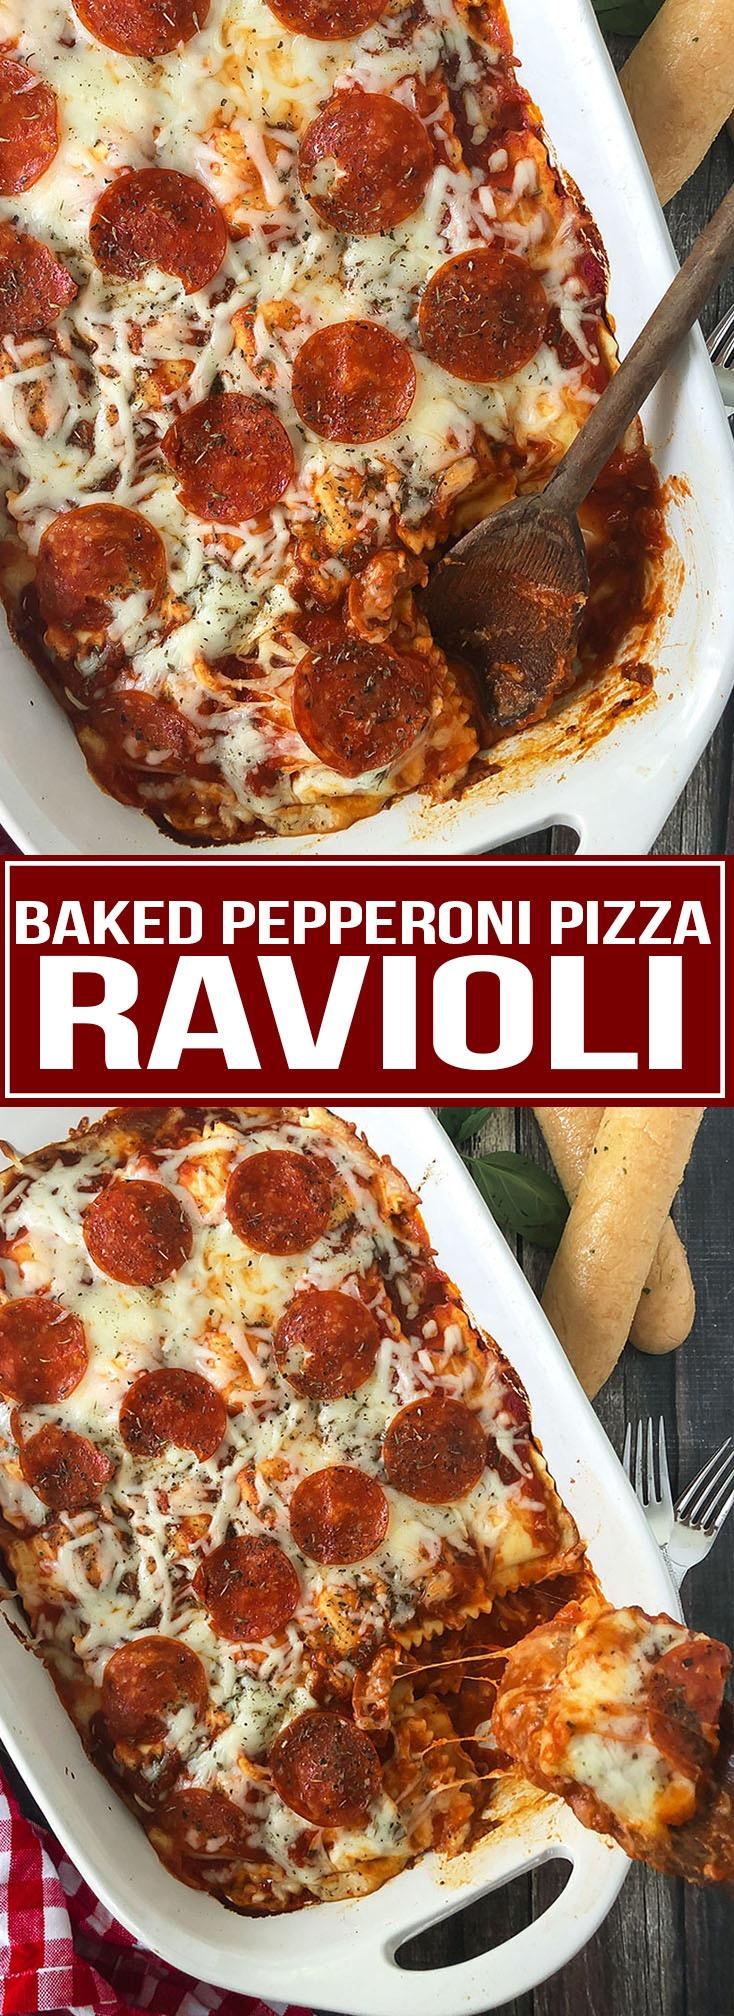 BAKED PEPPERONI PIZZA RAVIOLI